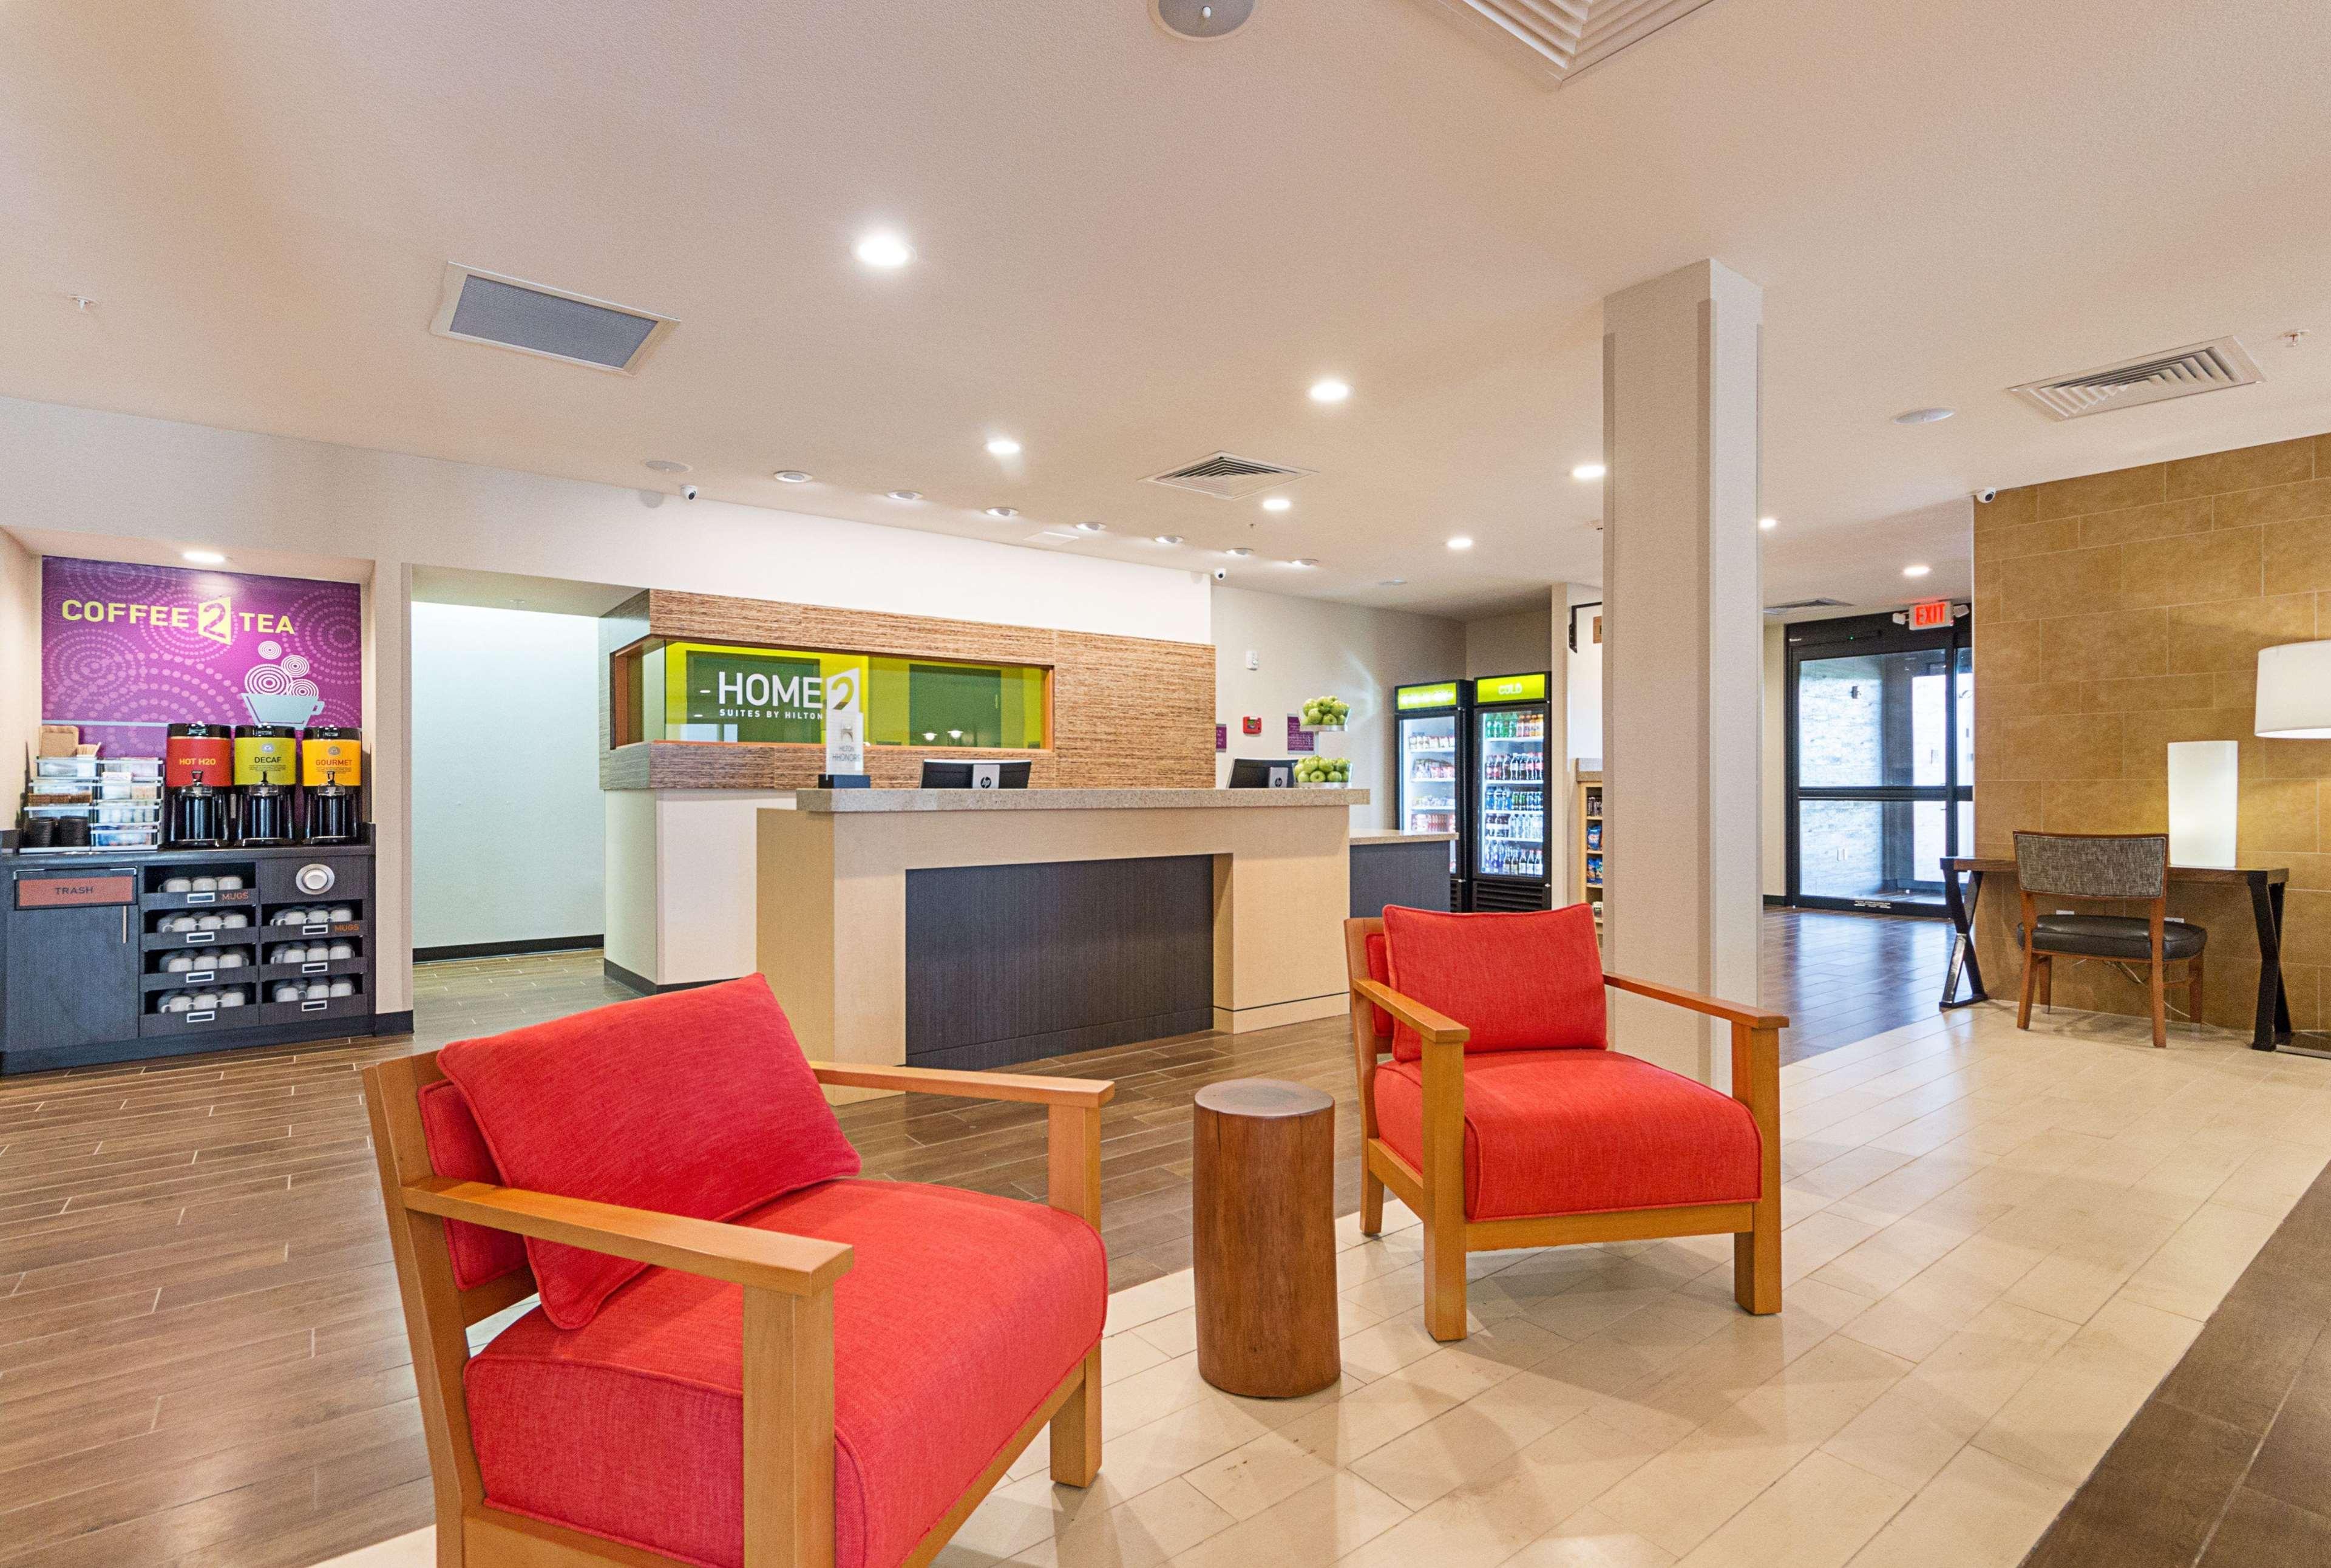 Home 2 Suites by Hilton - Yukon image 15